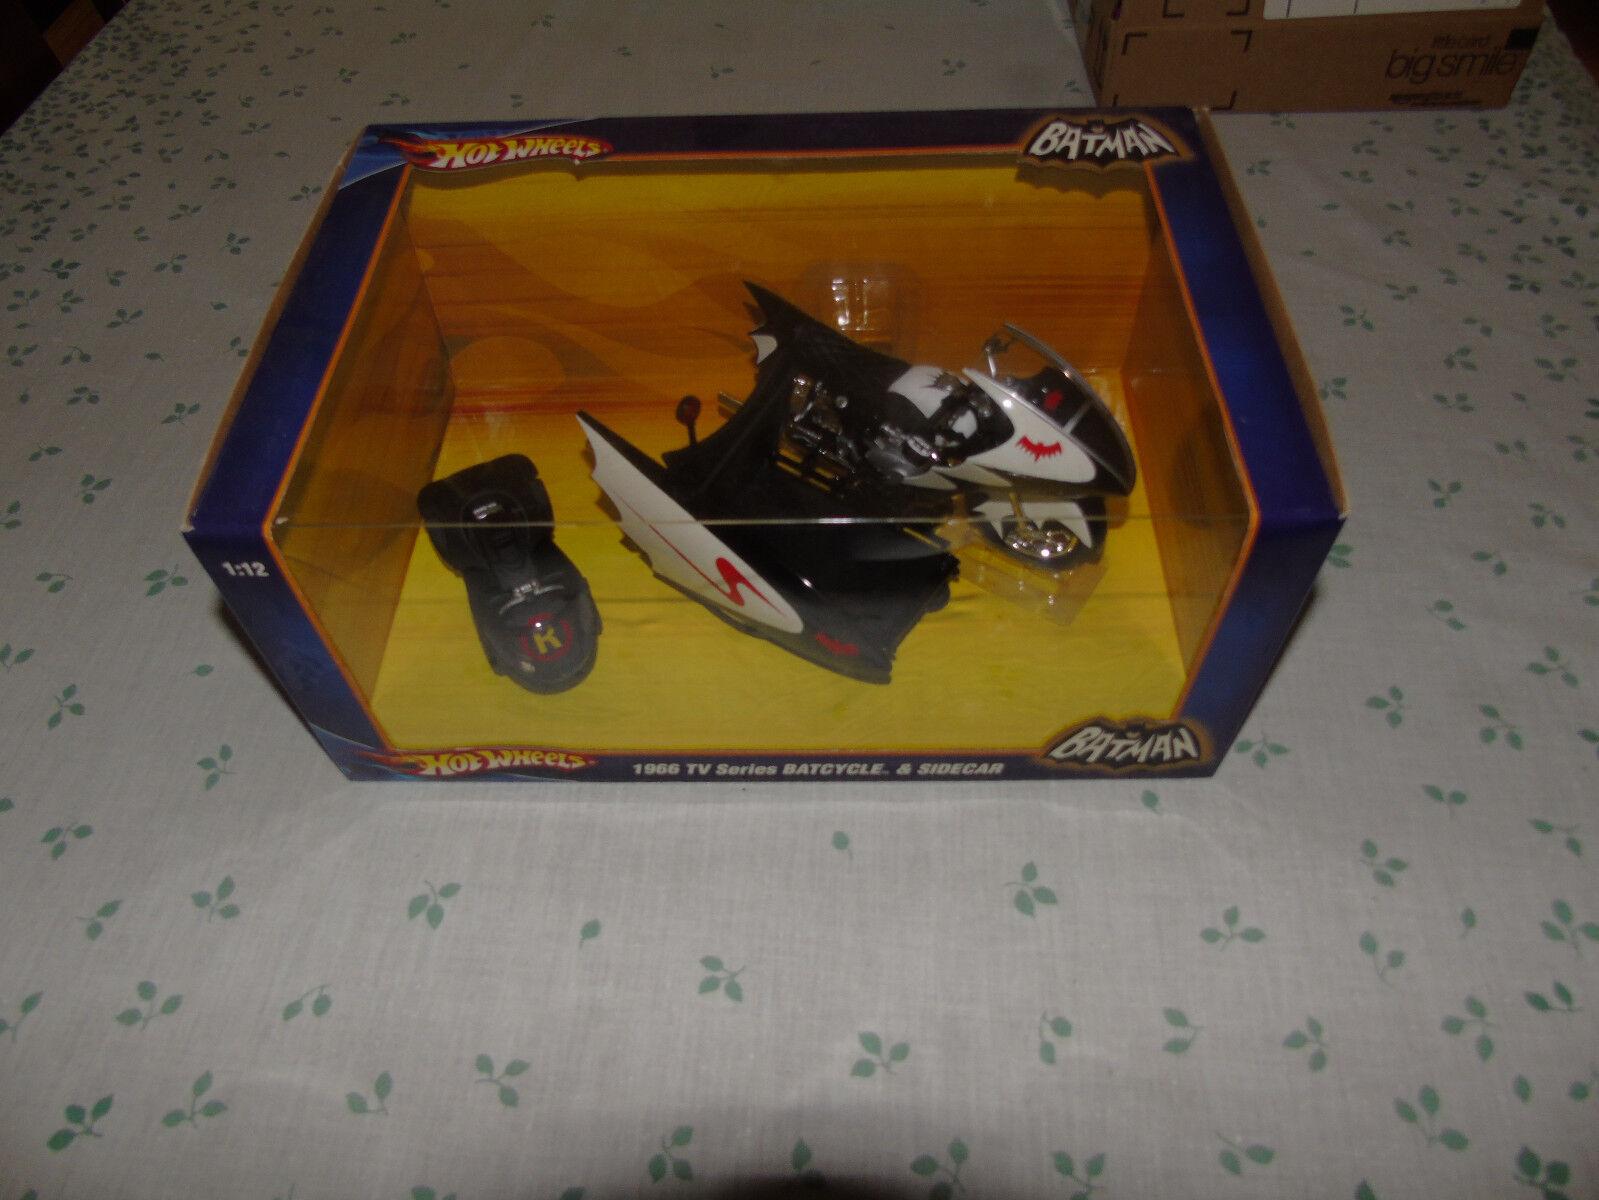 1966 Batcycle & & & Sidecar 1 12 Scale Hot Wheels DC COMICS 2009 Adam West TV Show c9bca8